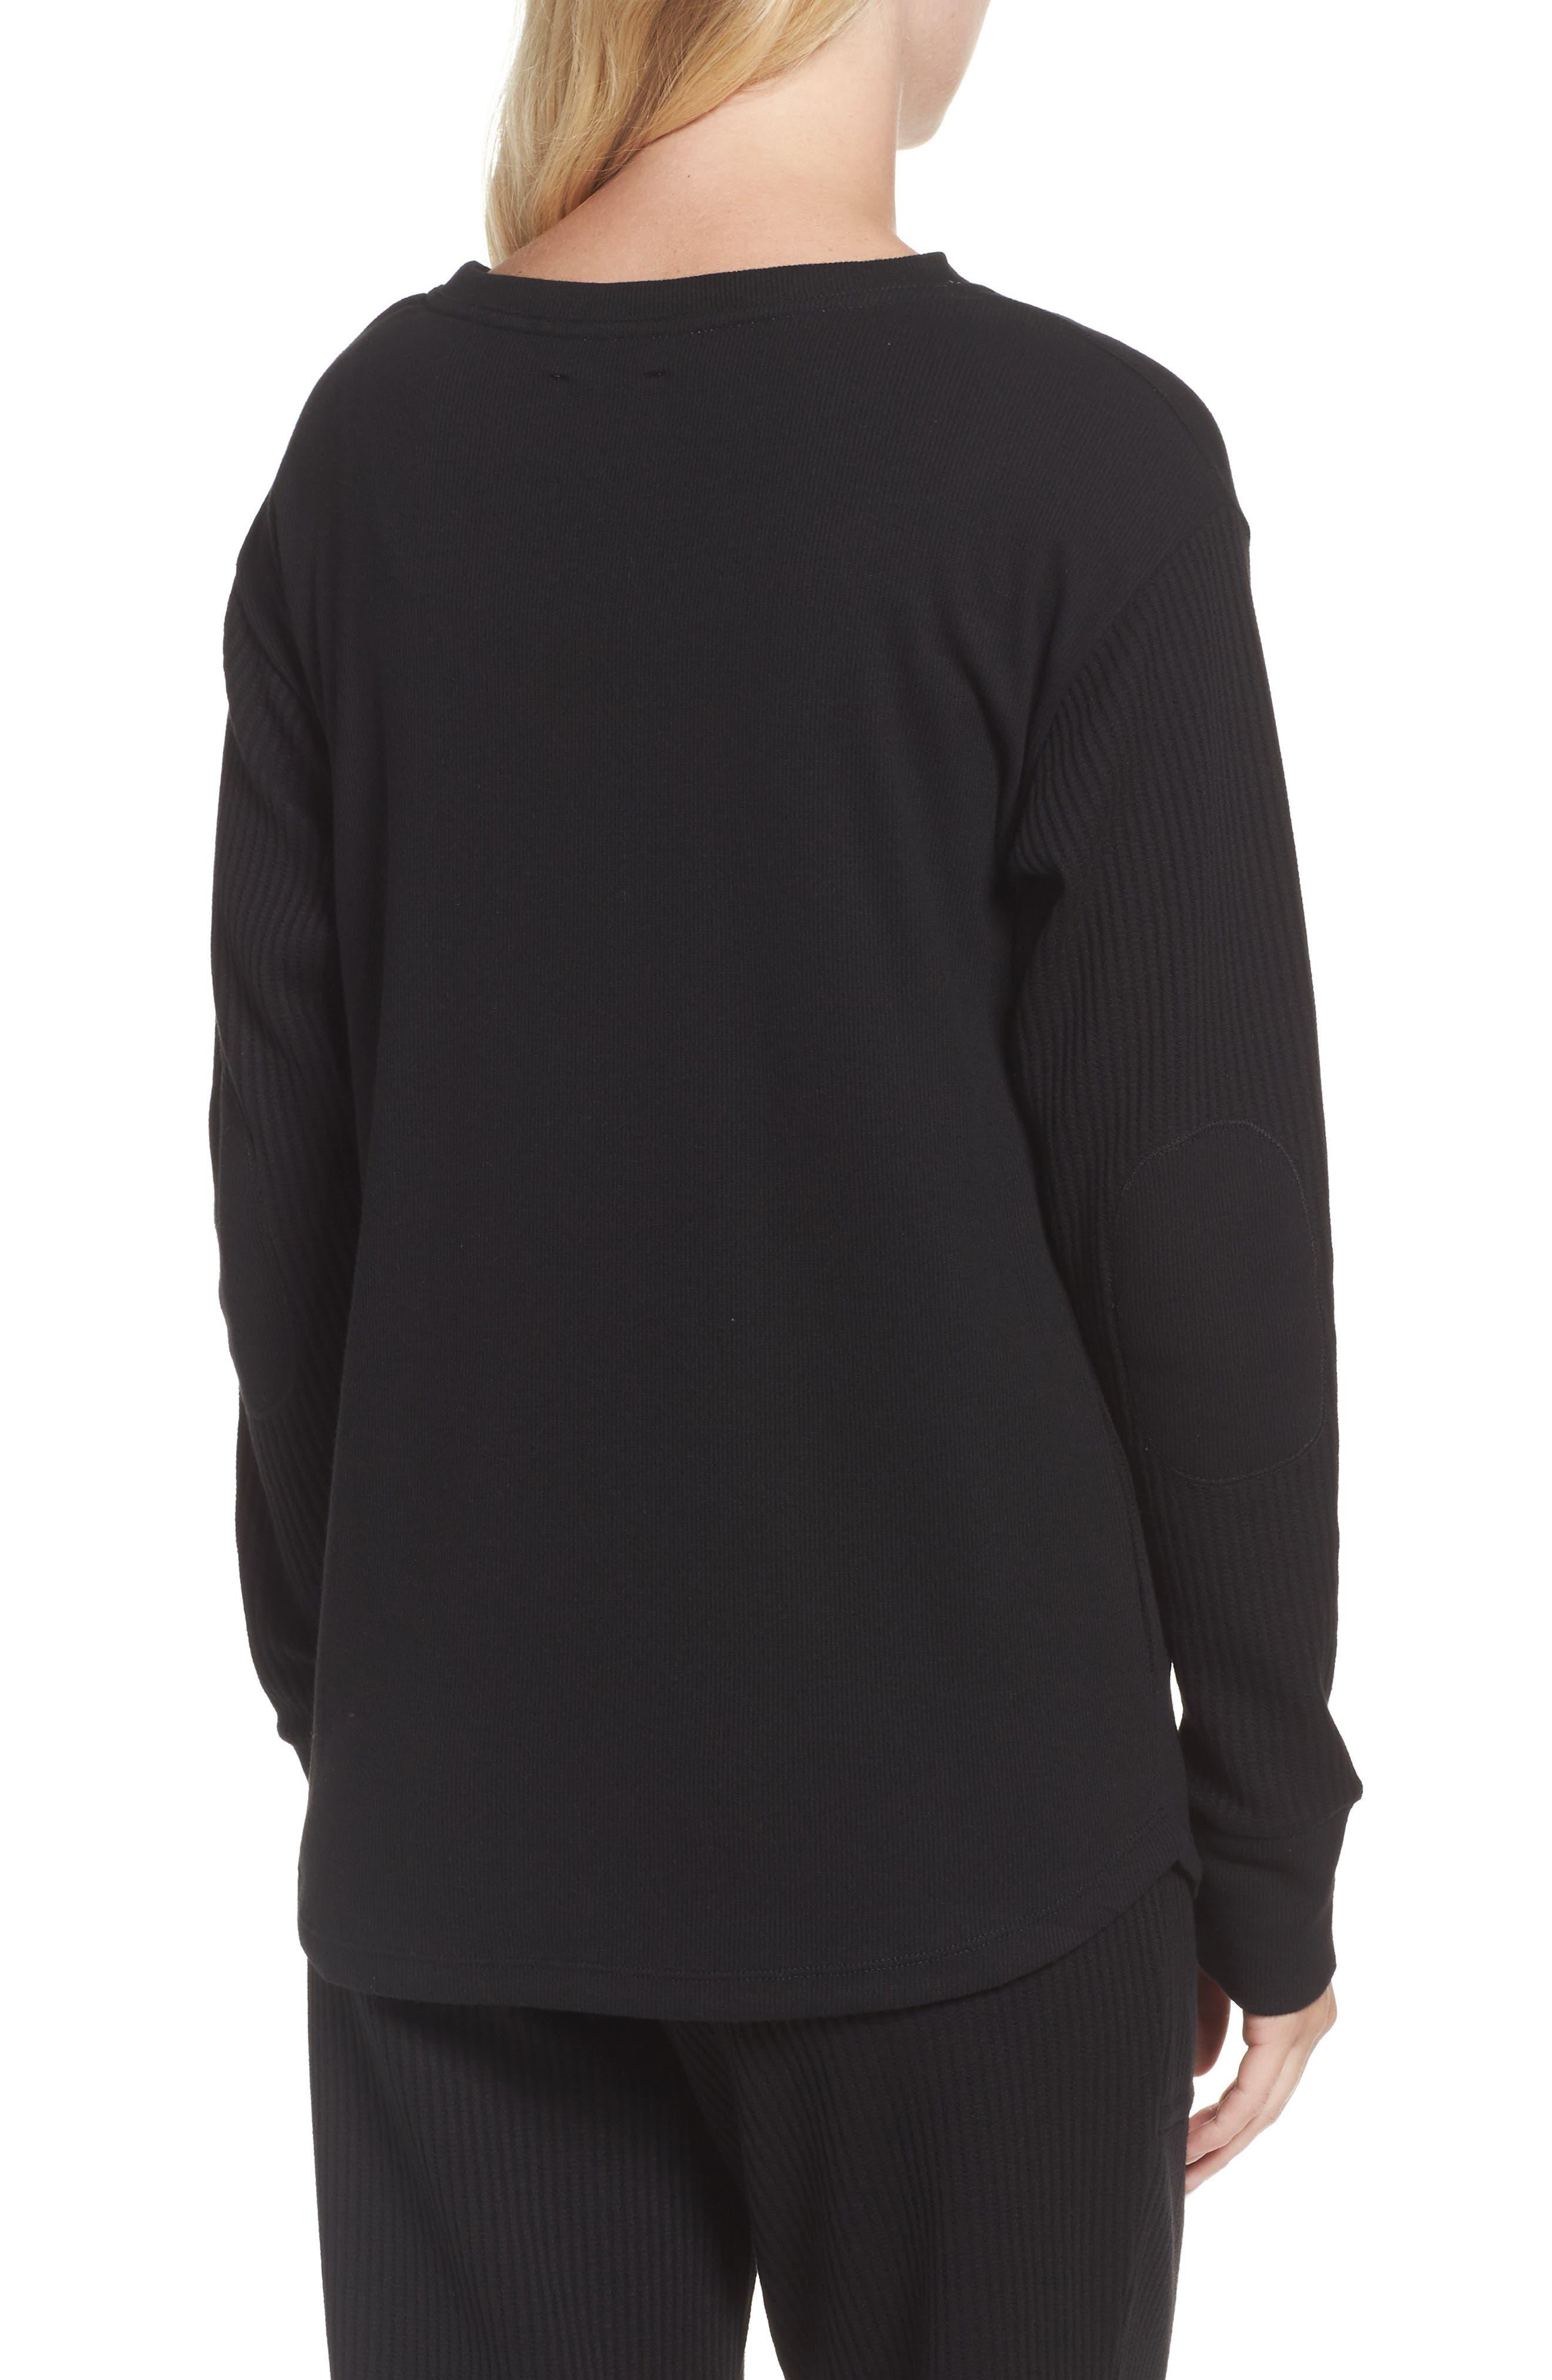 Long Sleeve Sleep Shirt,                             Alternate thumbnail 2, color,                             001